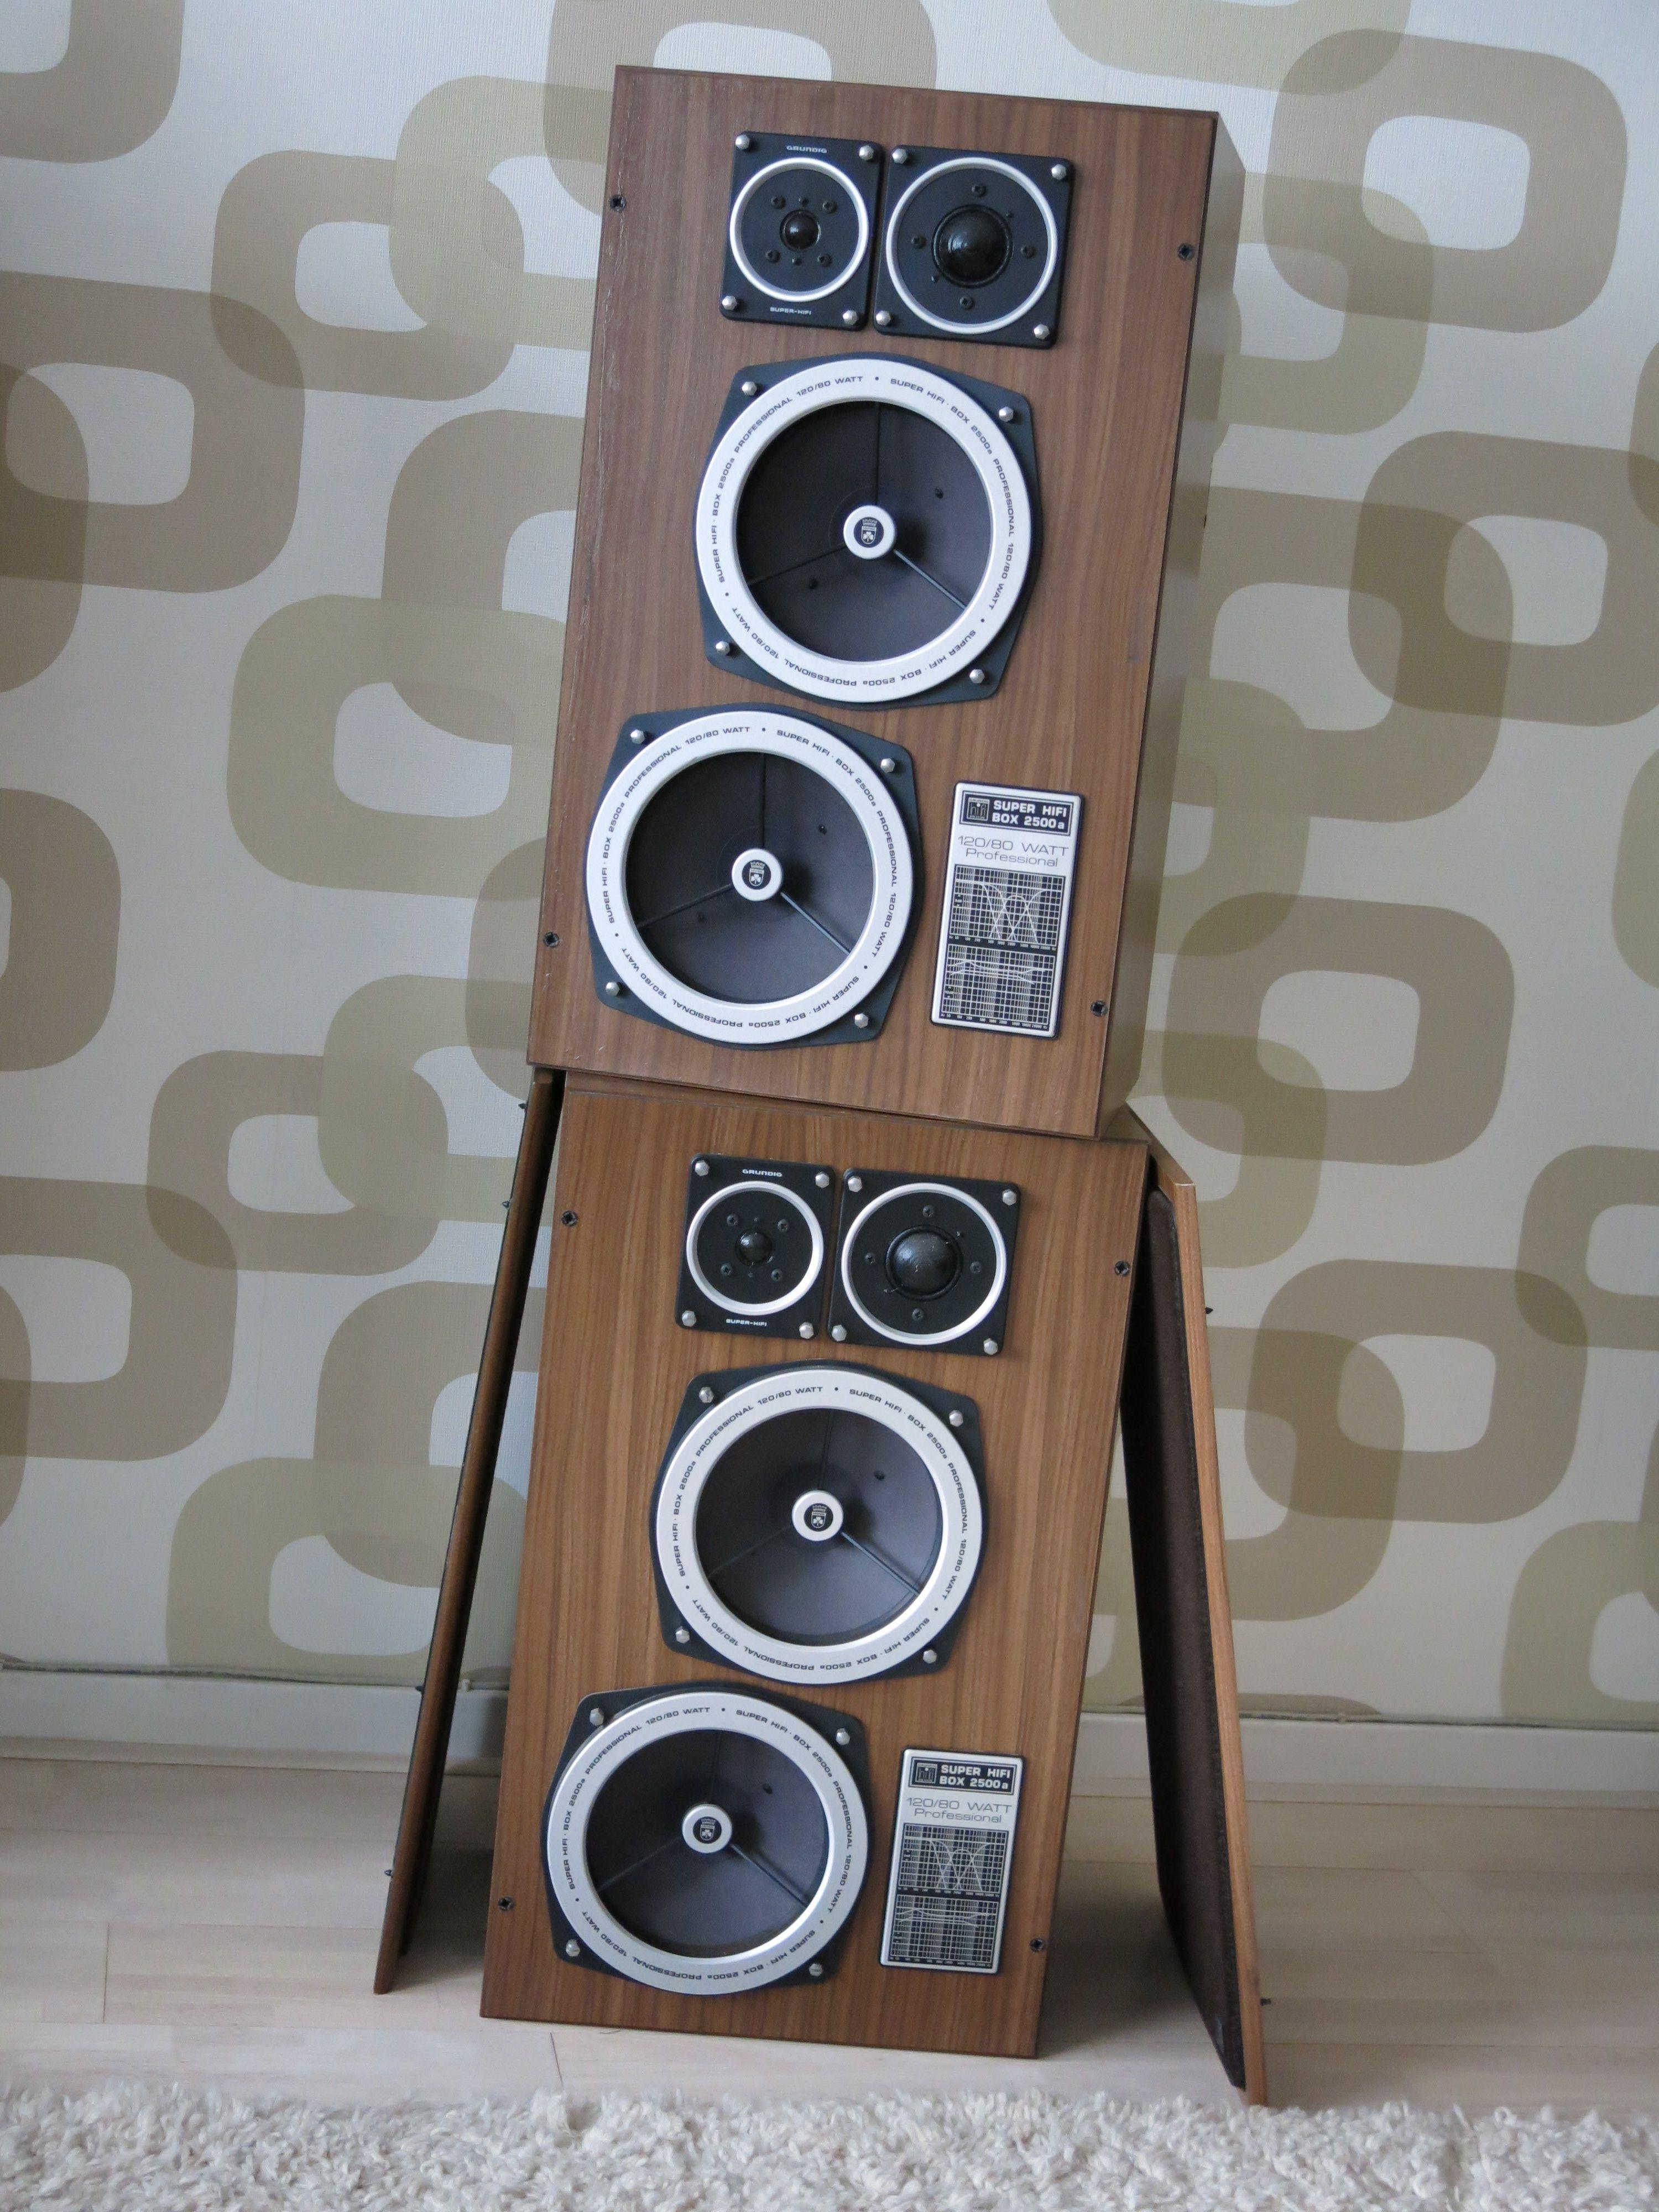 Vintage Grundig Super Hifi Box 2500a Loudspeakers Vintage Speakers Hifi Vintage Electronics